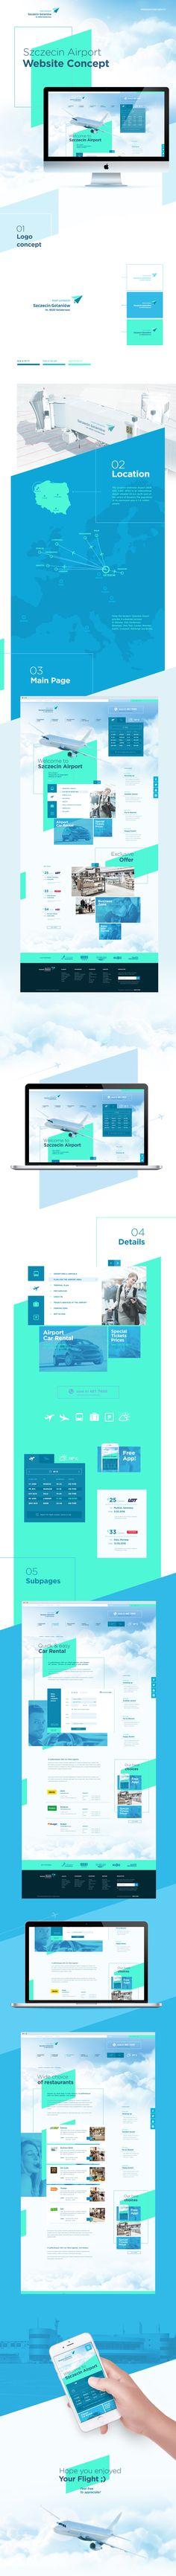 Szczecin Airport | website concept on Behance